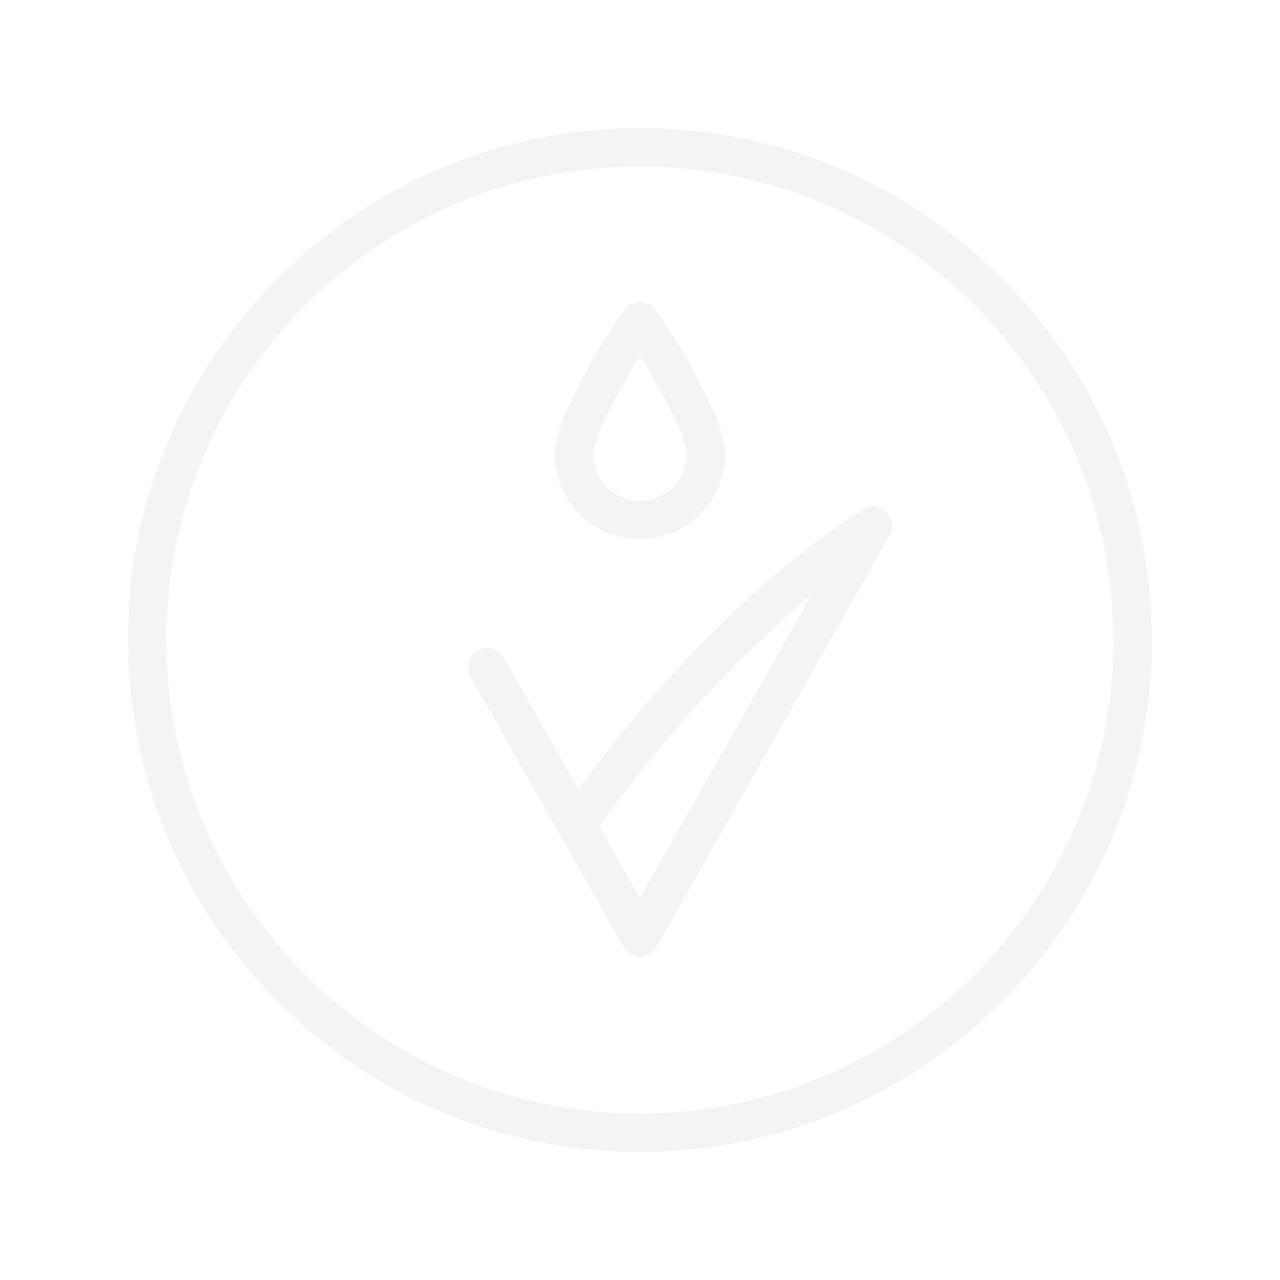 ORLY Breathable Nail Polish Manuka Me Crazy 5.3ml